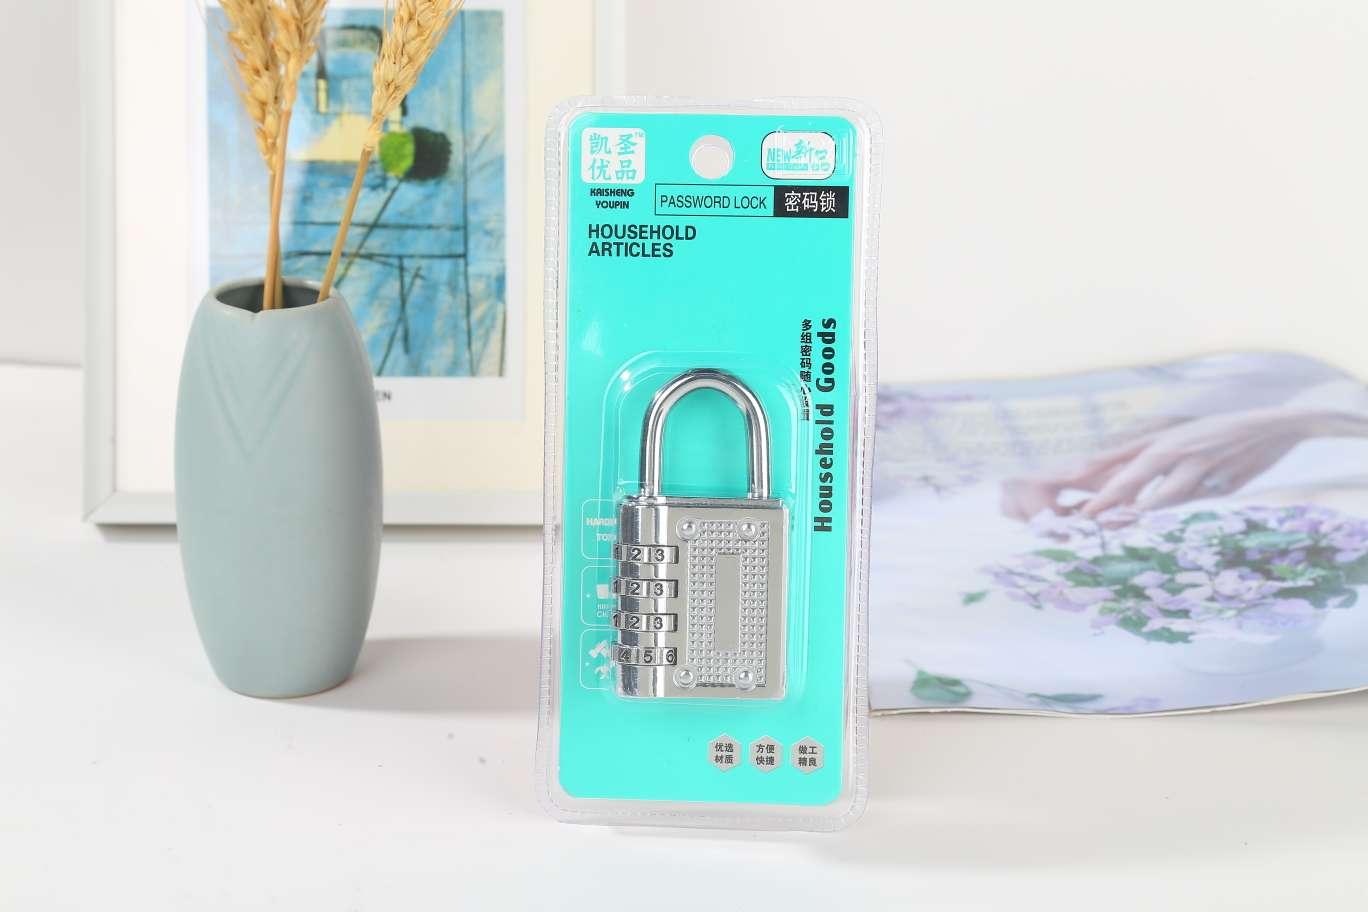 k-21大密码锁白色金属锌合金密码锁健身房安全挂锁更衣柜子锁长梁行李箱锁头